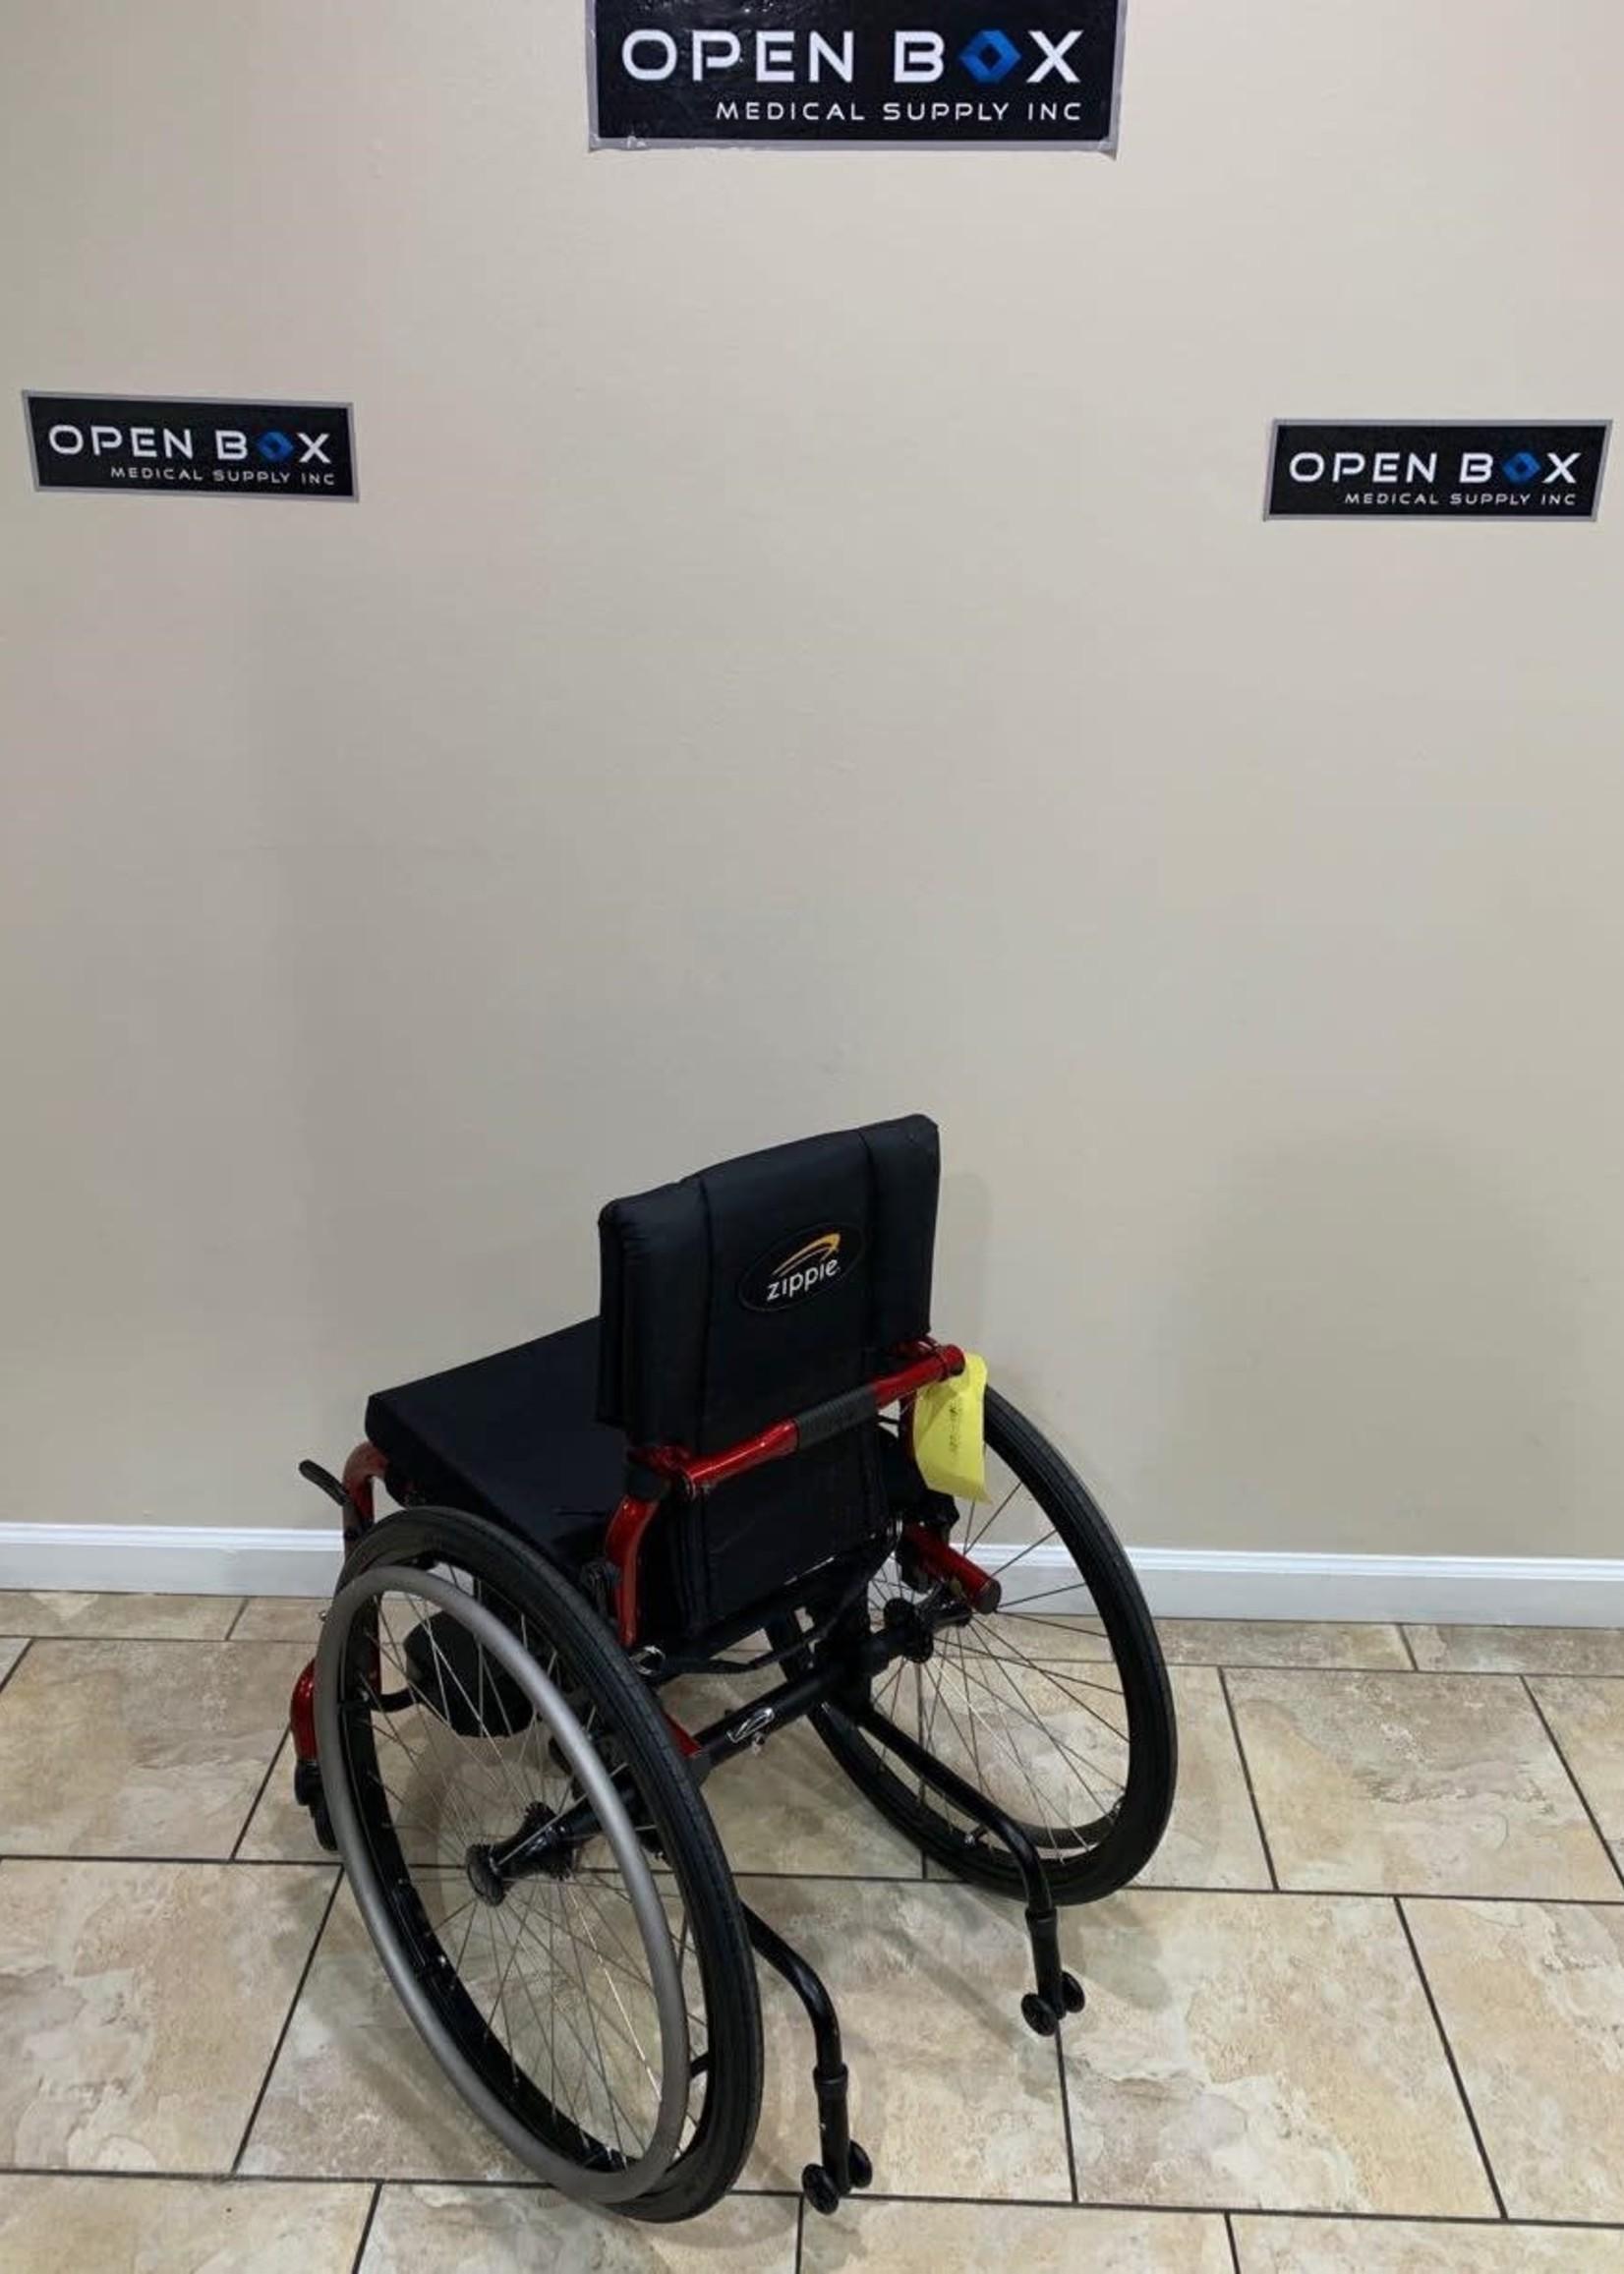 Sunrise Medical Zippie Zone Ultralight Manual Wheelchair